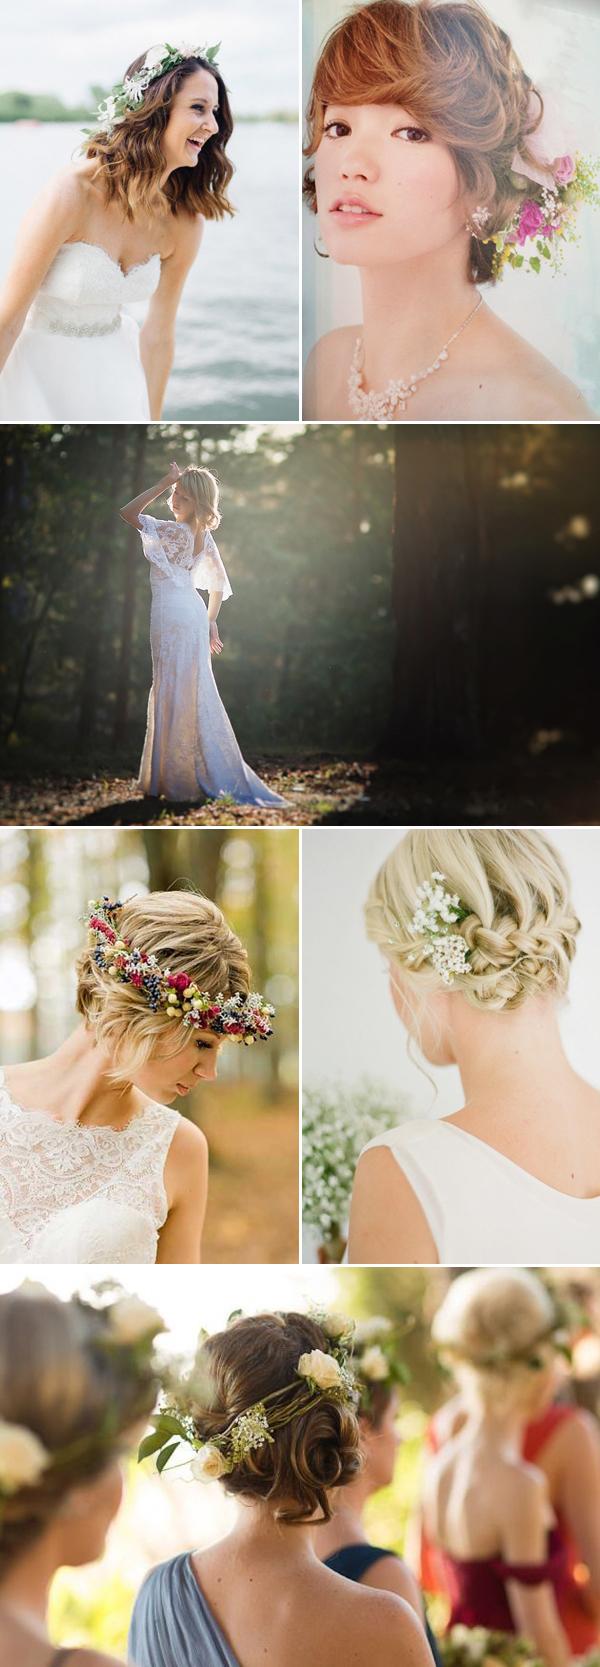 33 Chic Short Bridal Hairstyles Praise Wedding